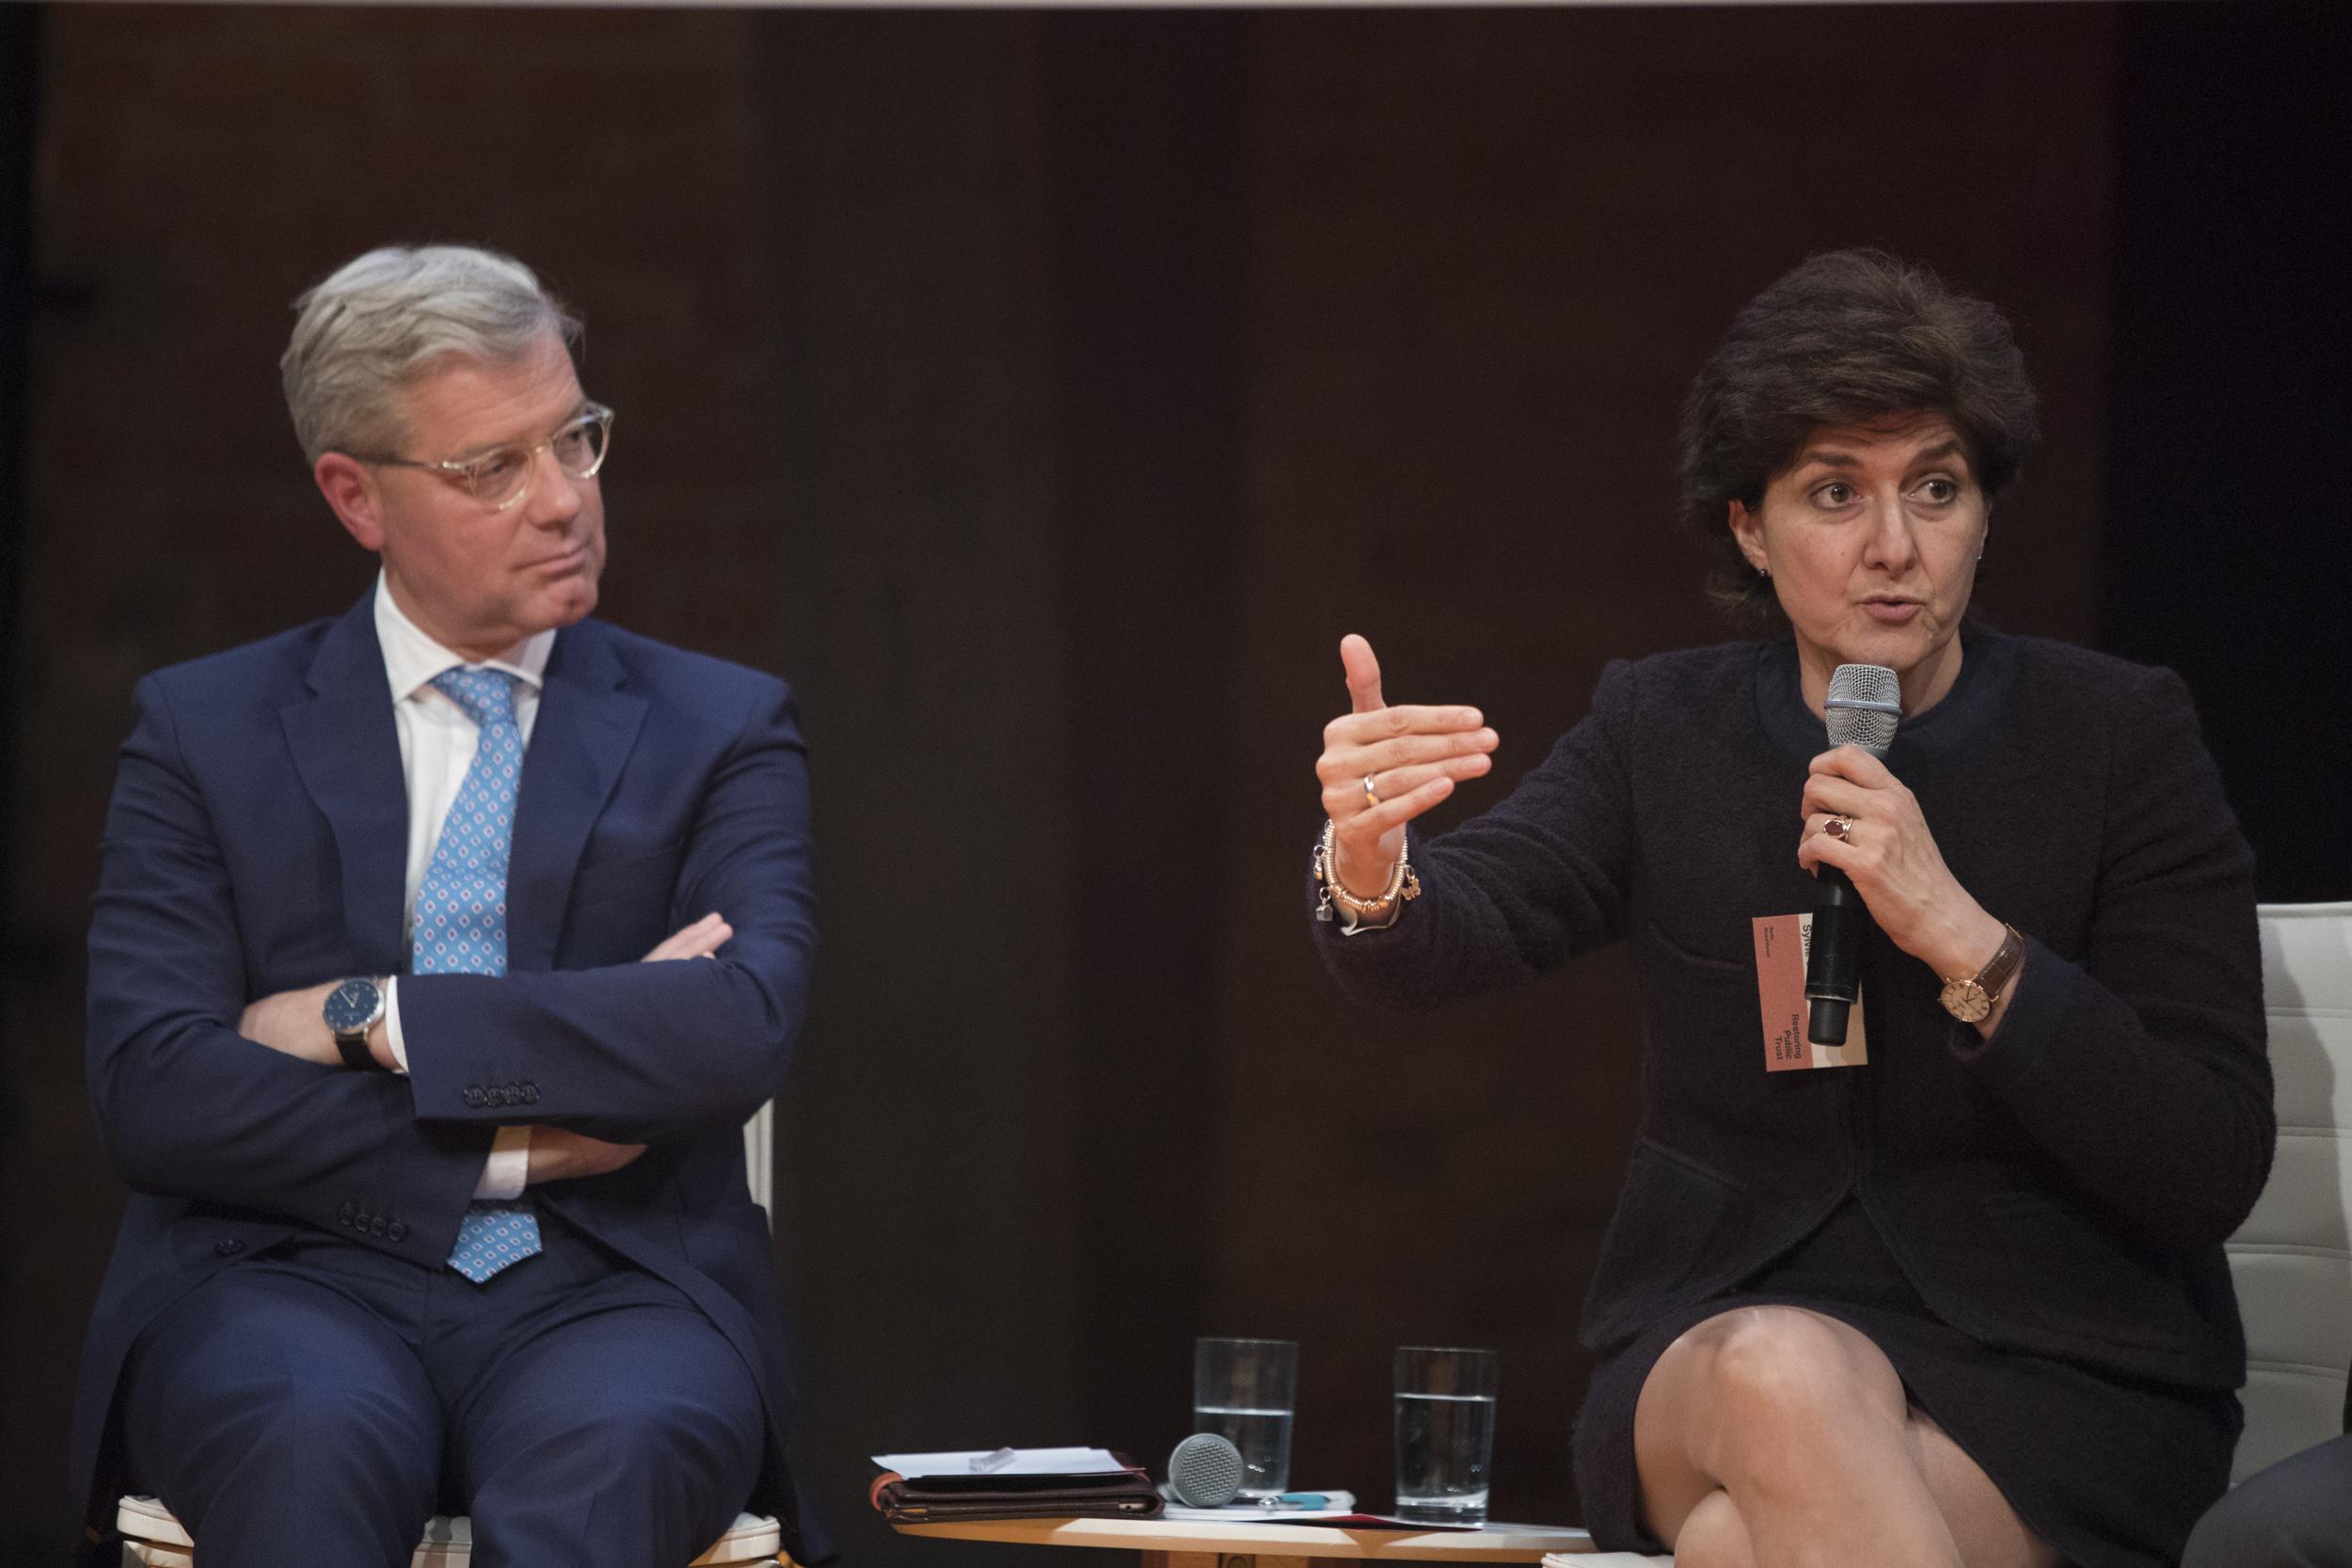 BerlinGlobalForum_17__CL_0173_Claudia Leisinger.jpg